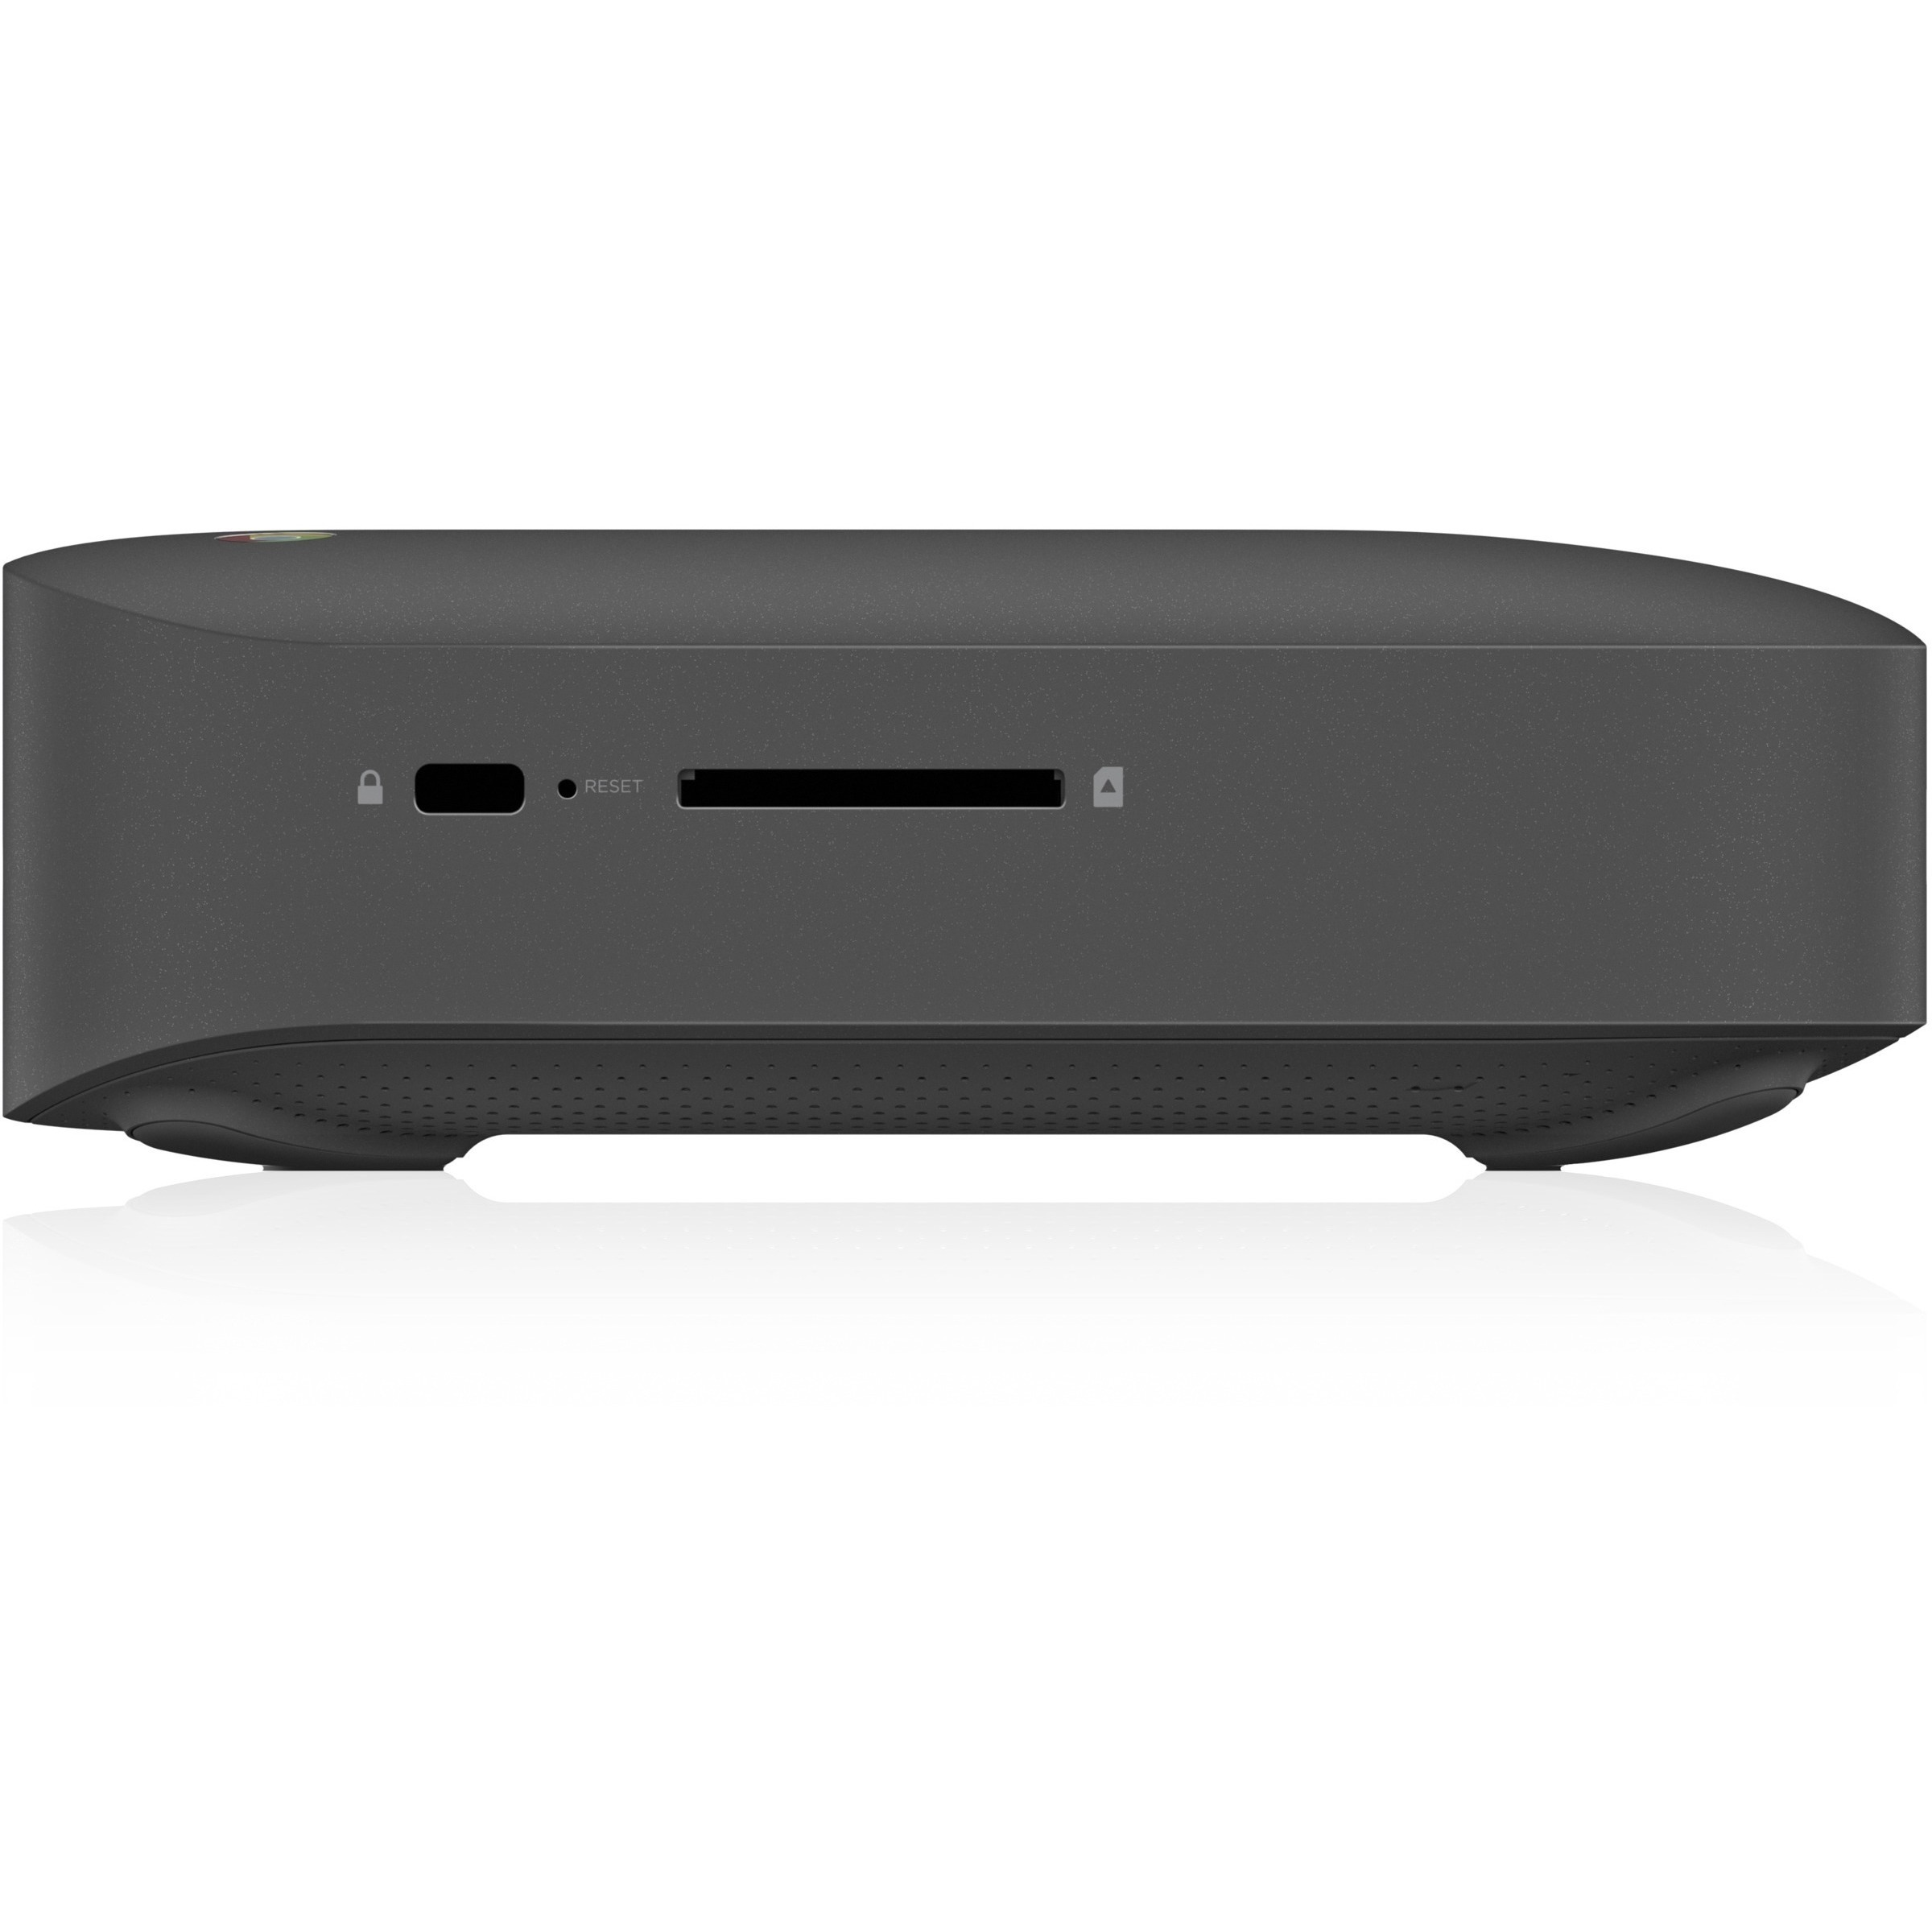 HP Chromebox Desktop Computer - Intel Celeron 2955U 1.40 GHz - Mini PC